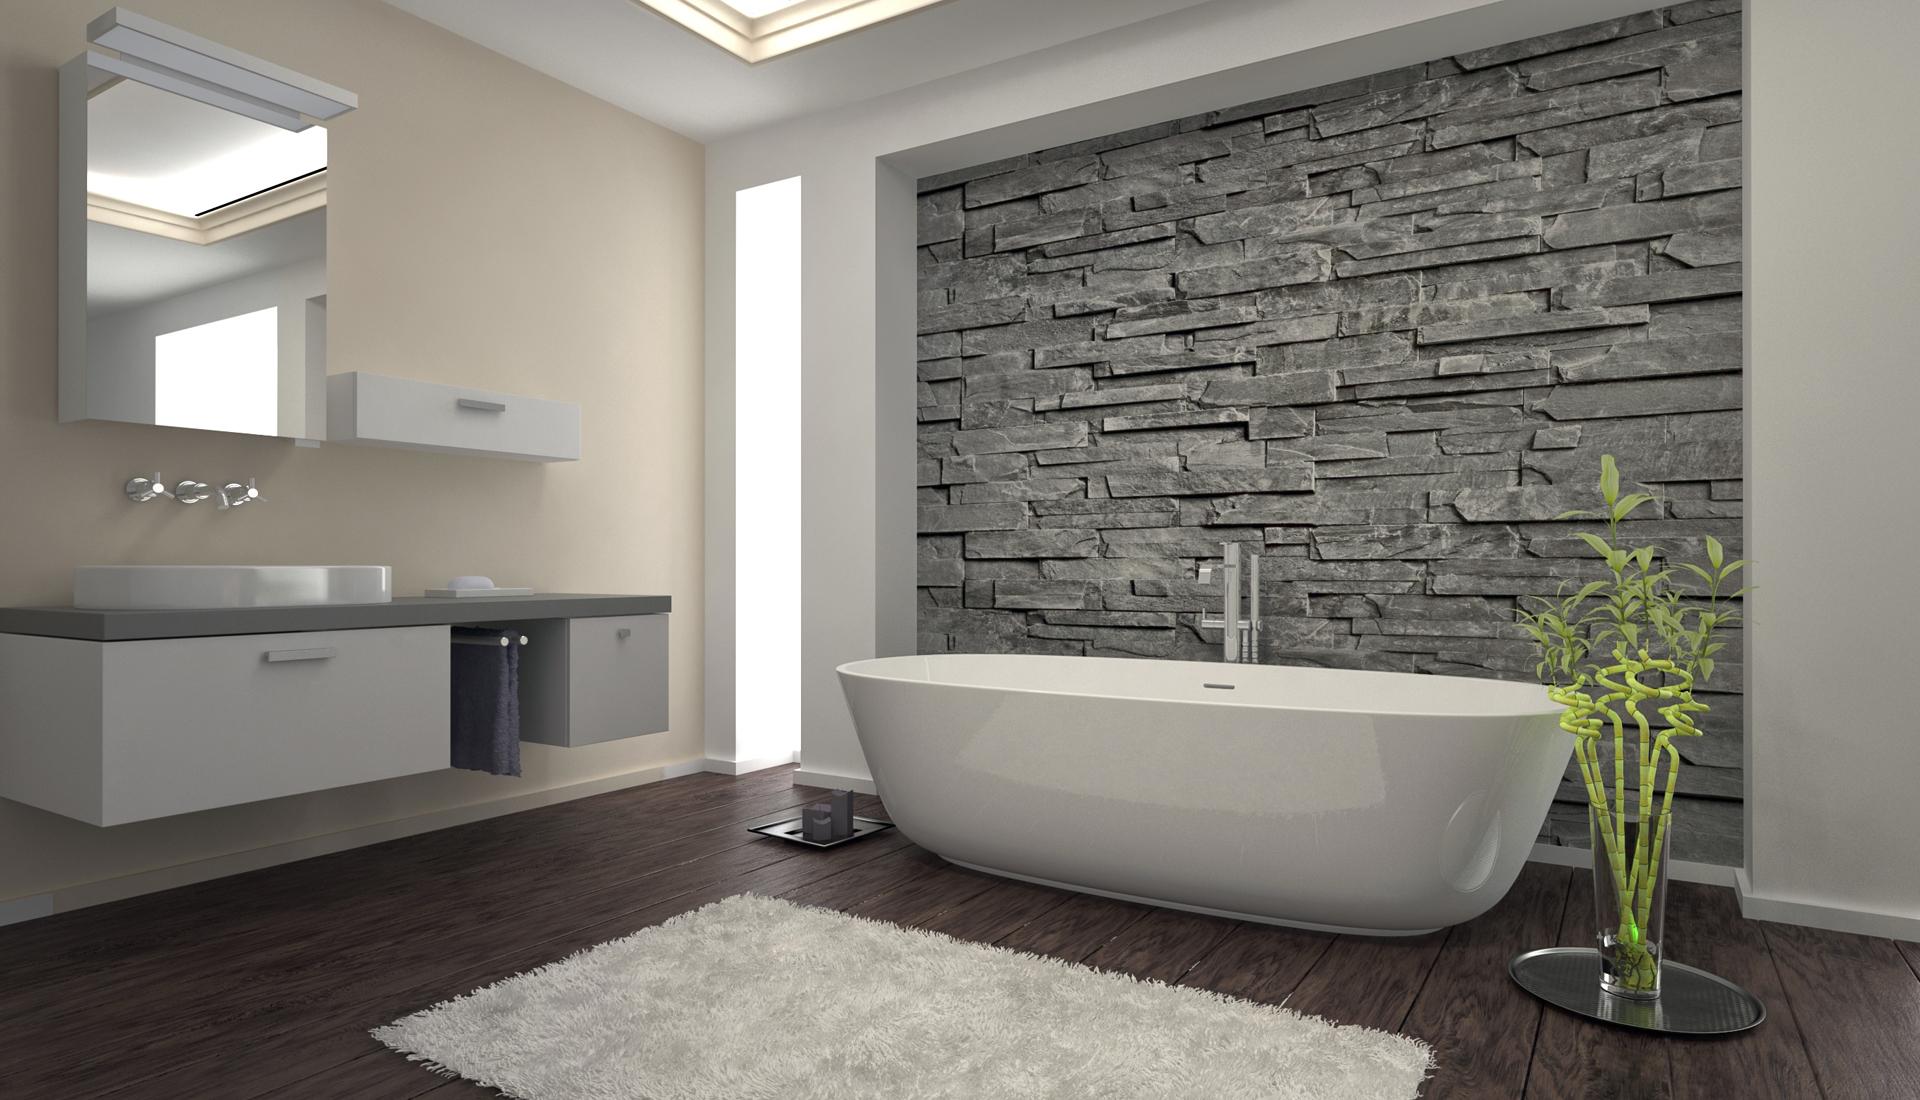 Bathroom Elegance: Renovation Tips for the Old Bathroom - The ...